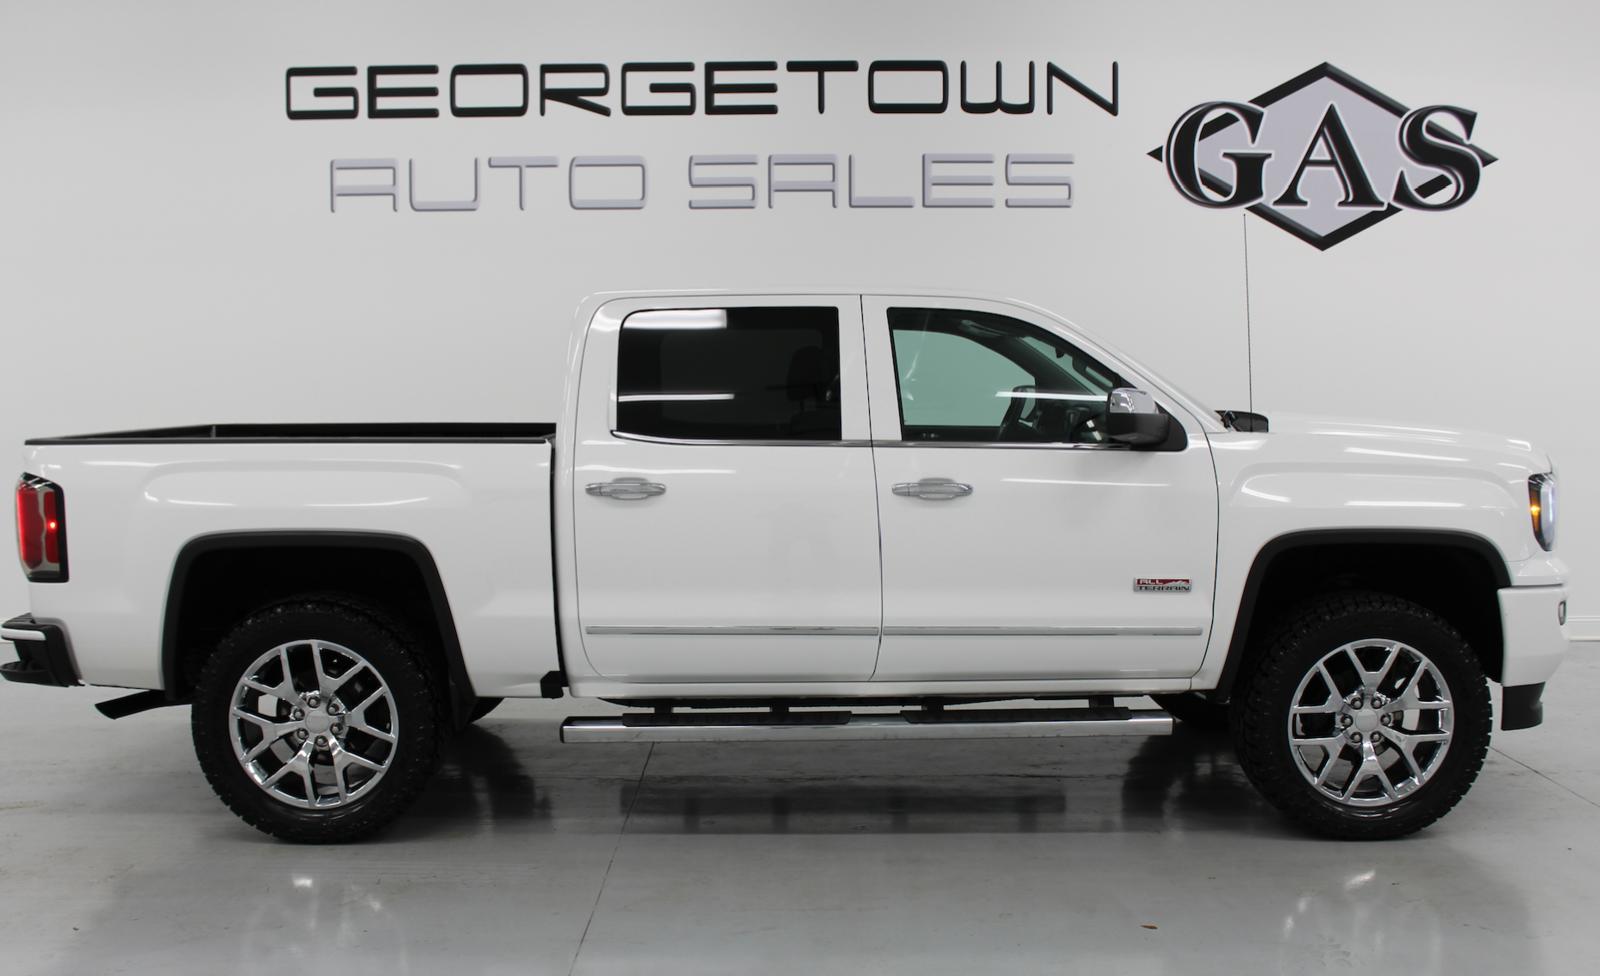 Georgetown Auto Sales, Inc. - Georgetown, SC: Read ...